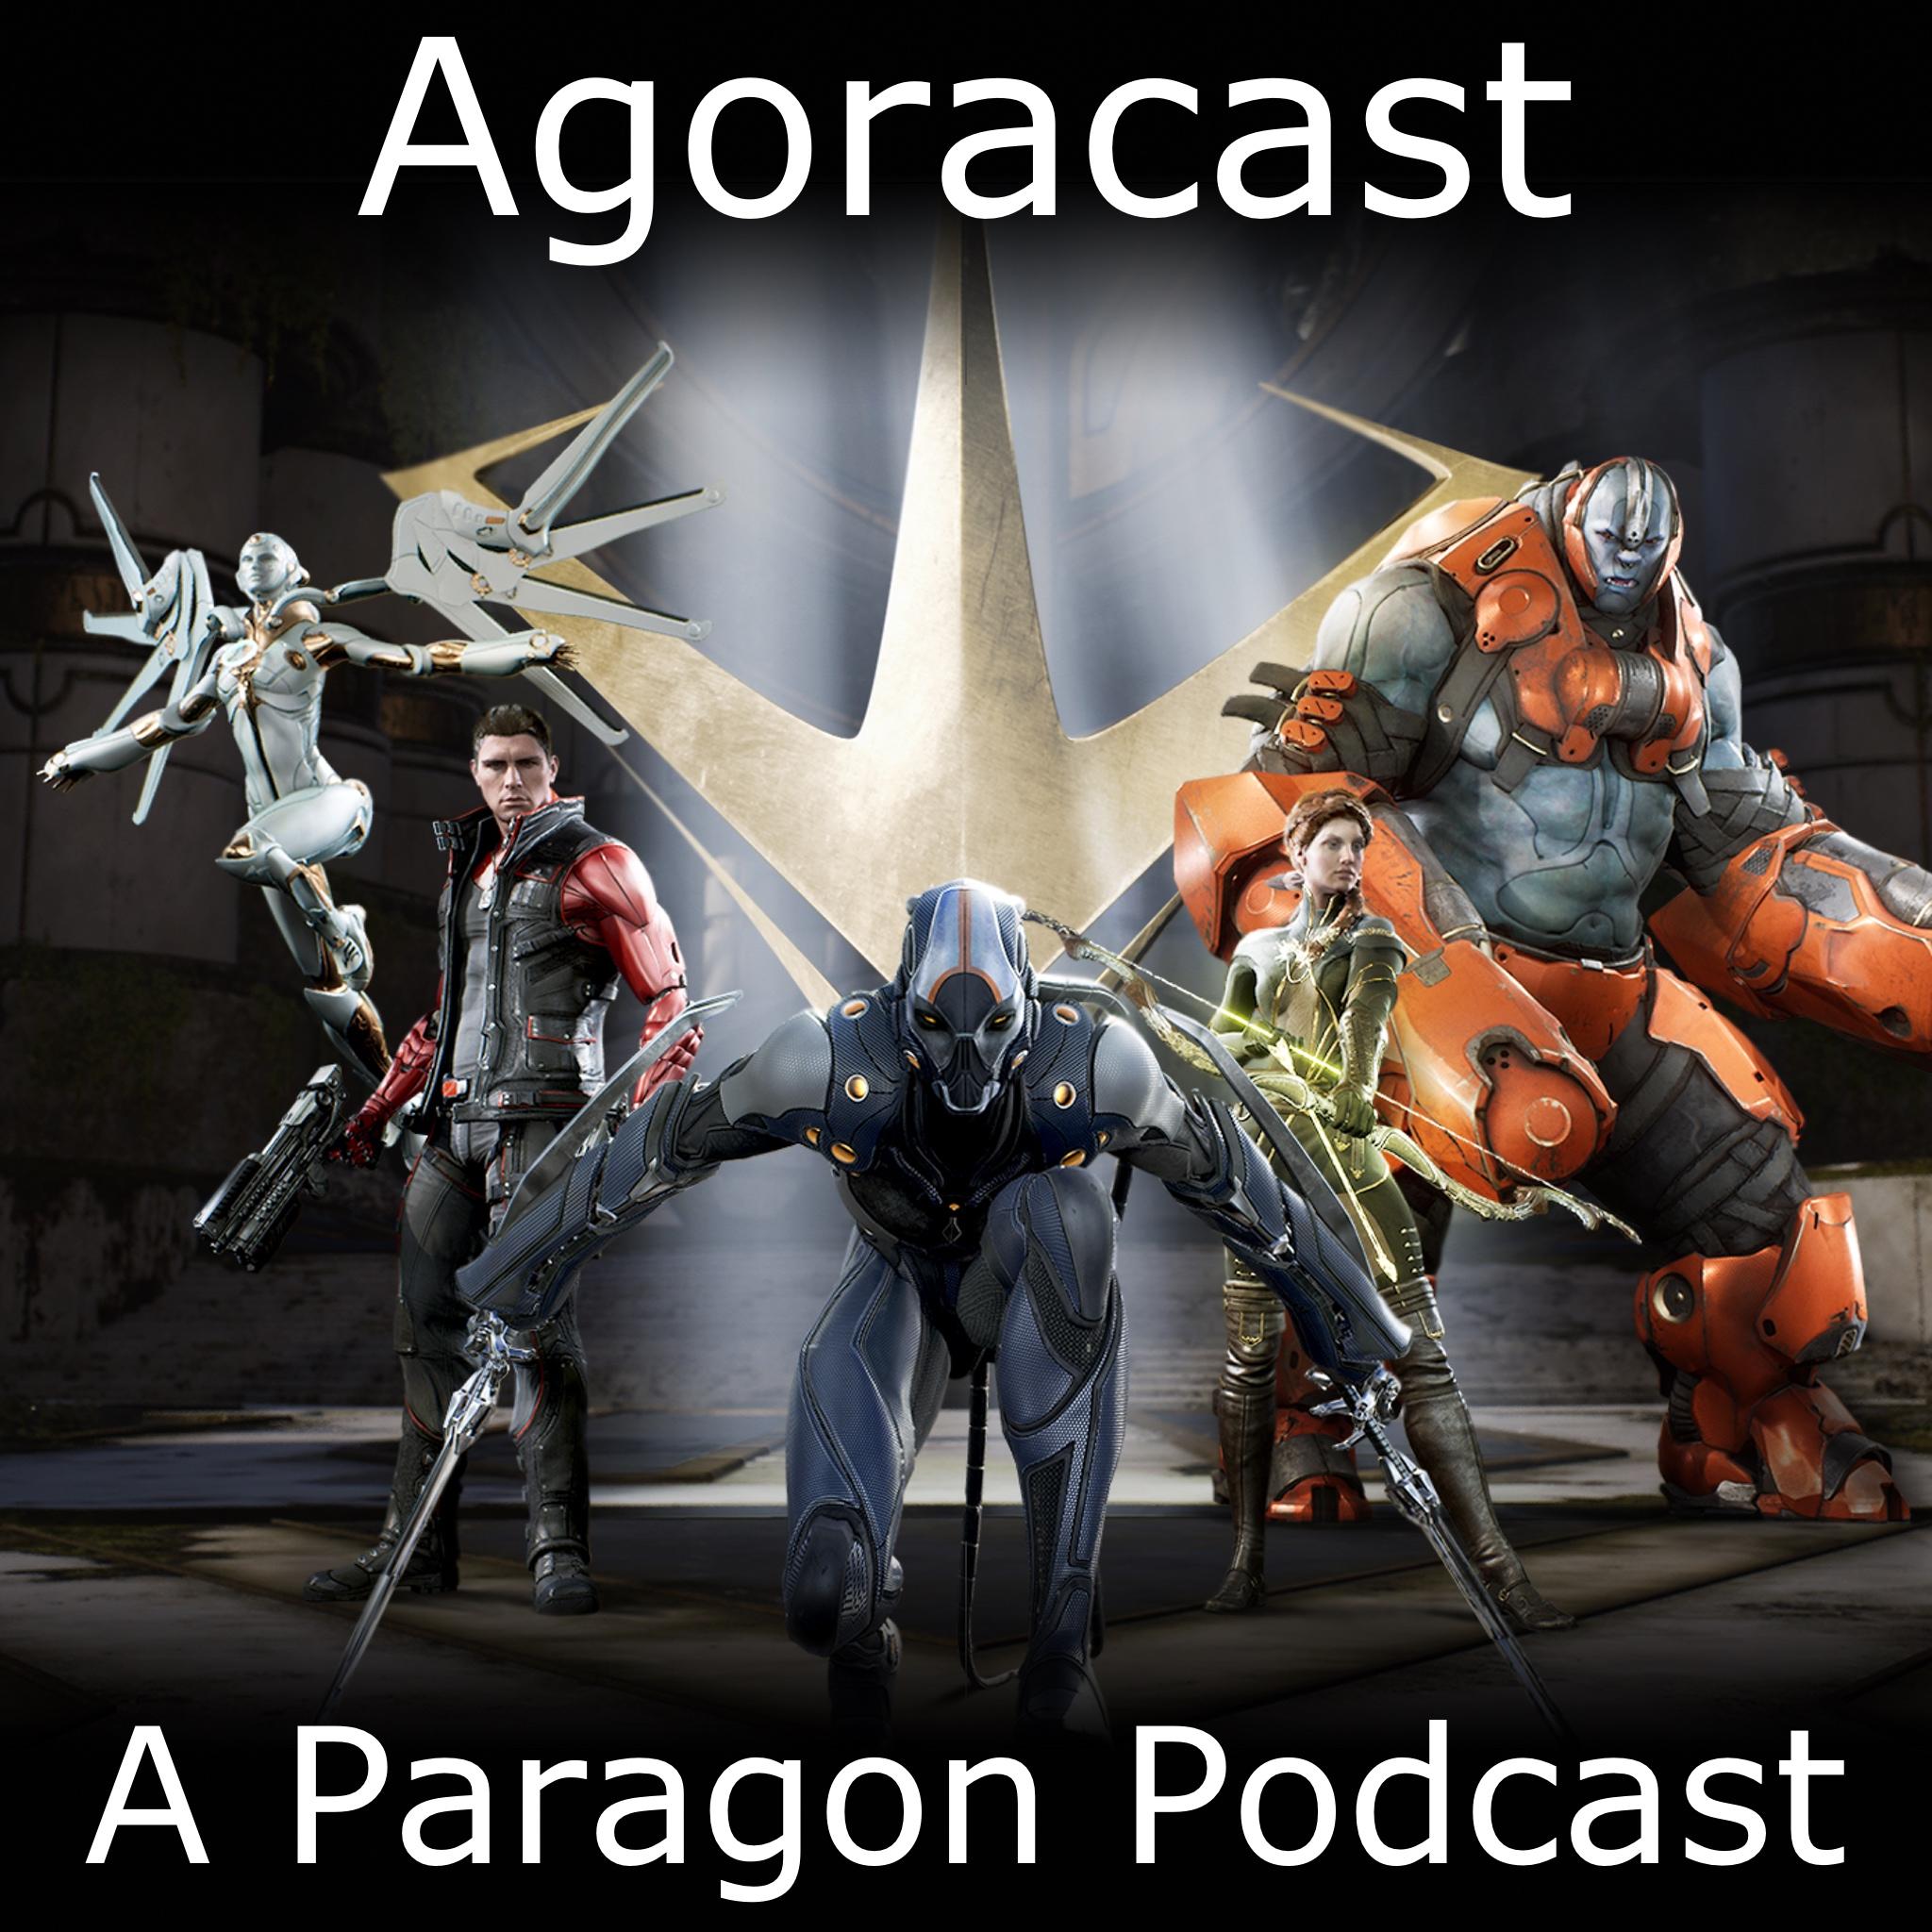 Agoracast: A Paragon Podcast